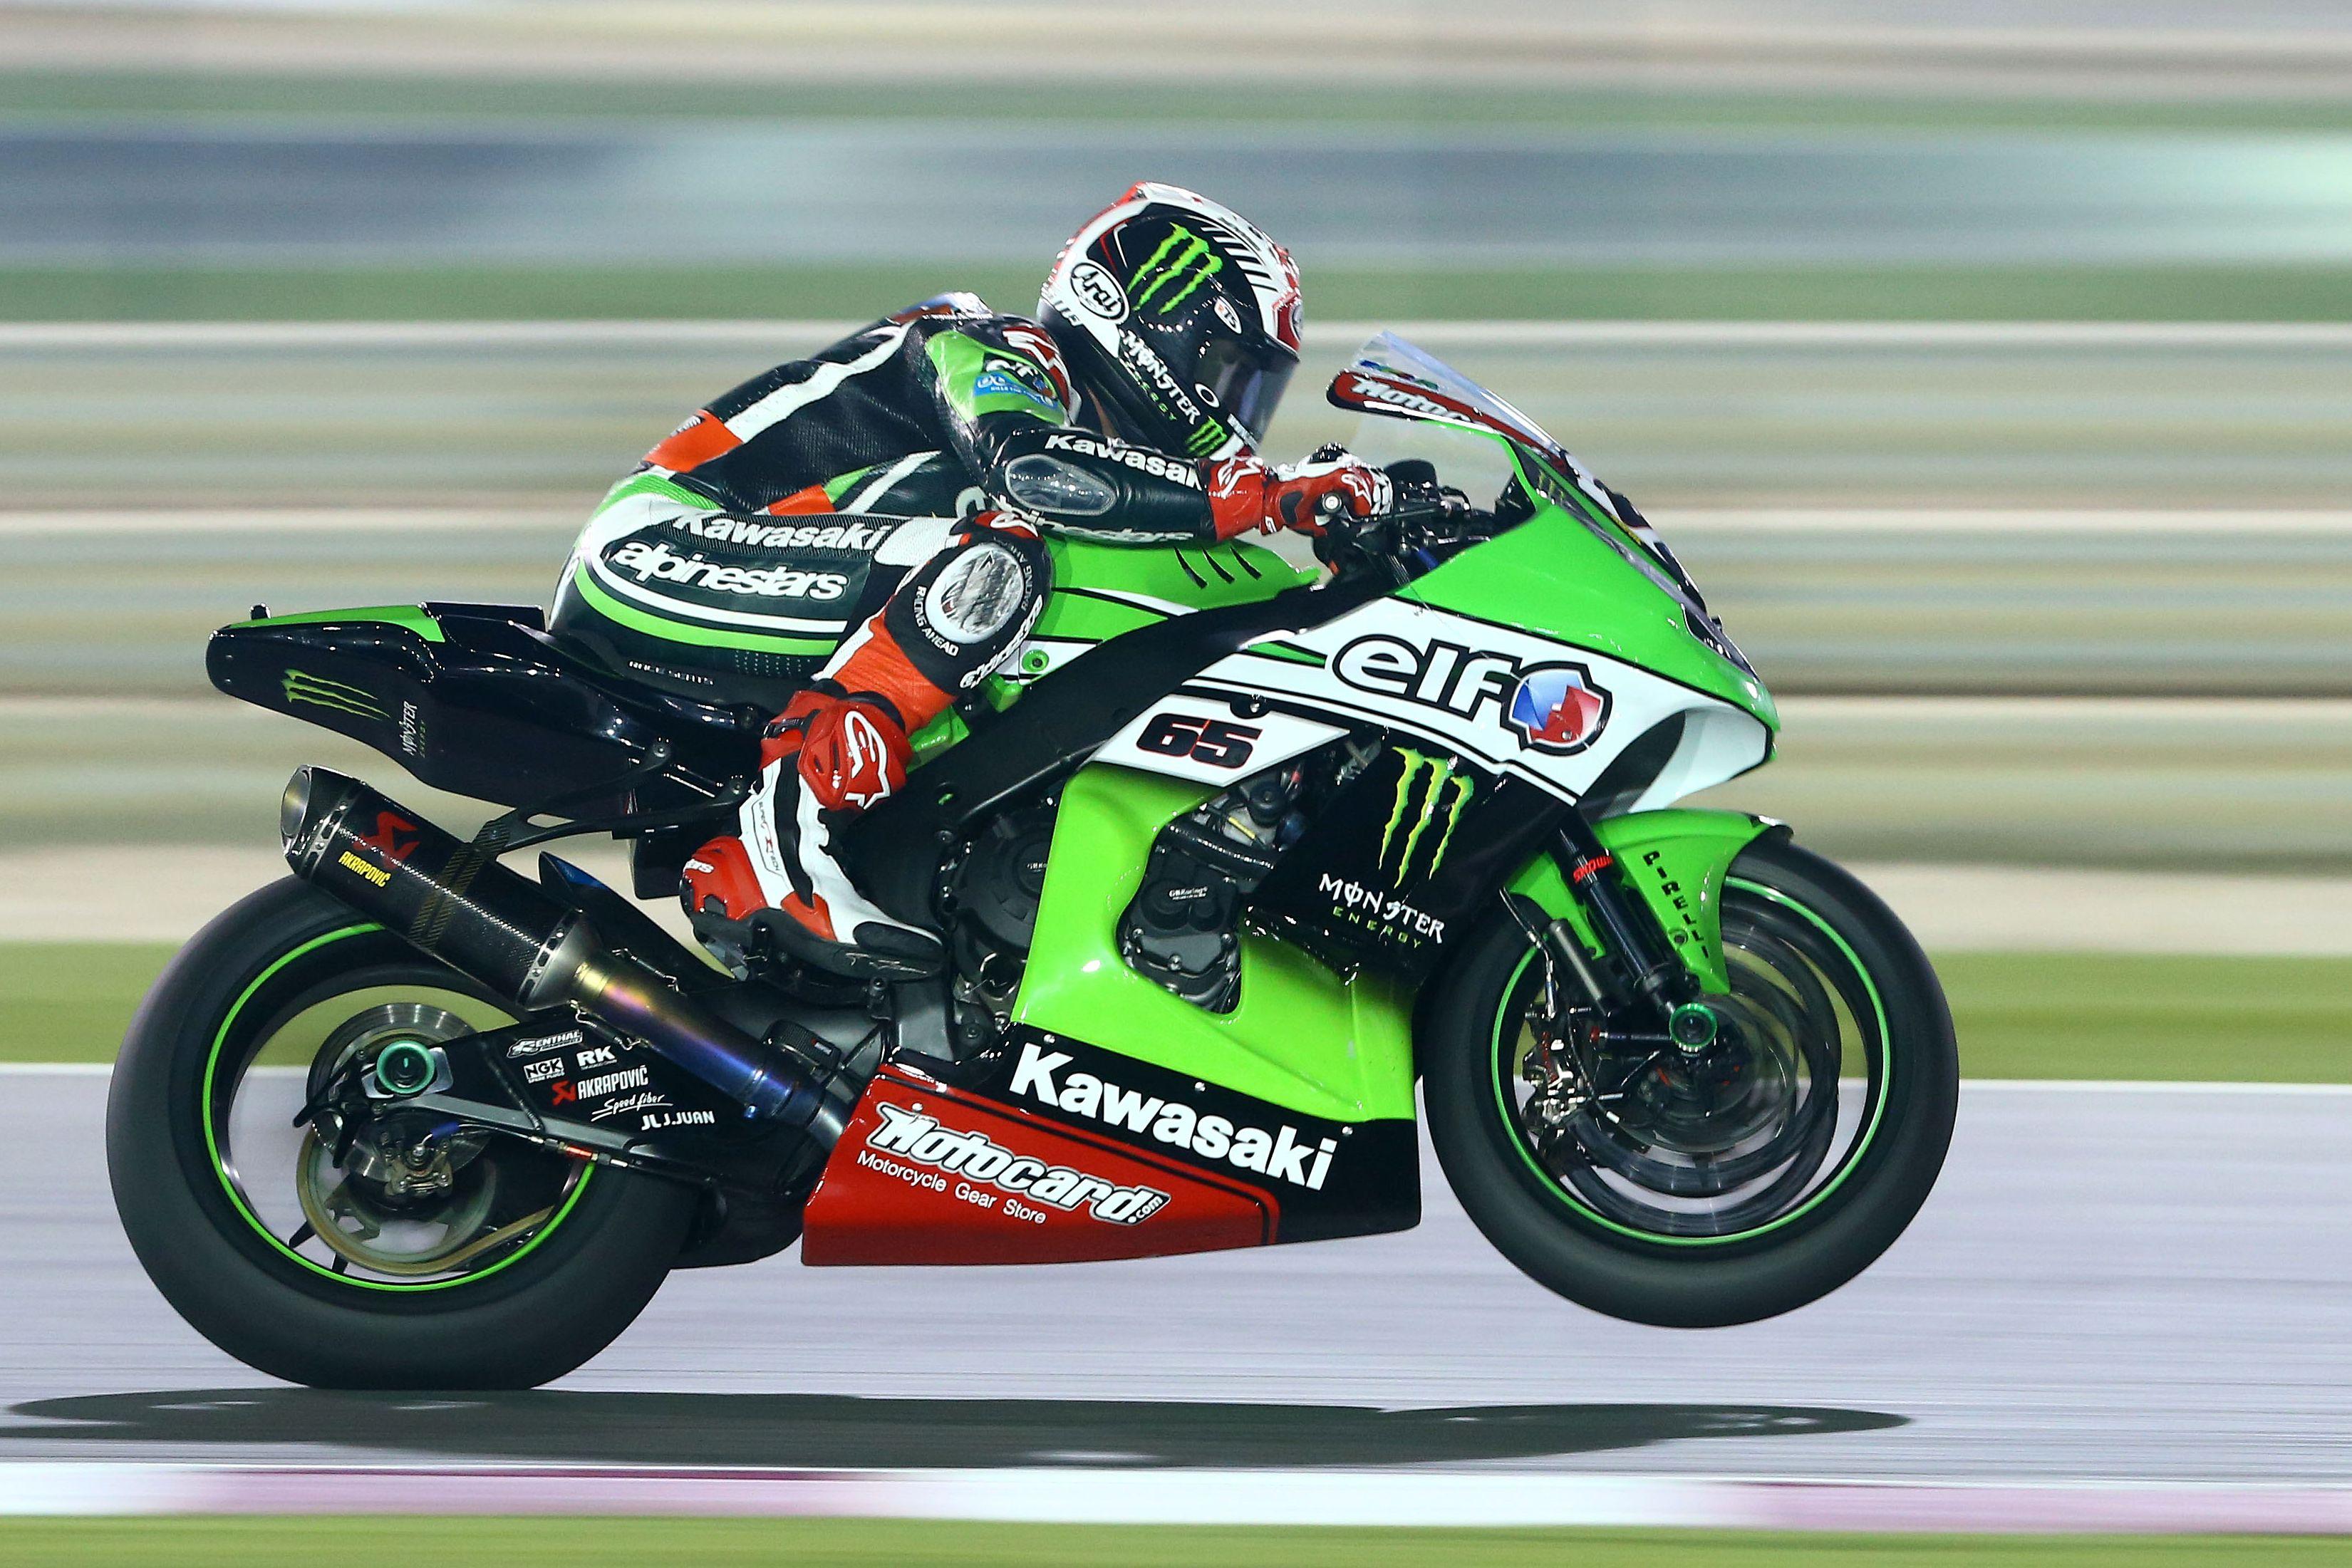 race bikes motorcycle bike motogp yamaha visordown kawasaki ratio racing m1 score win total zx